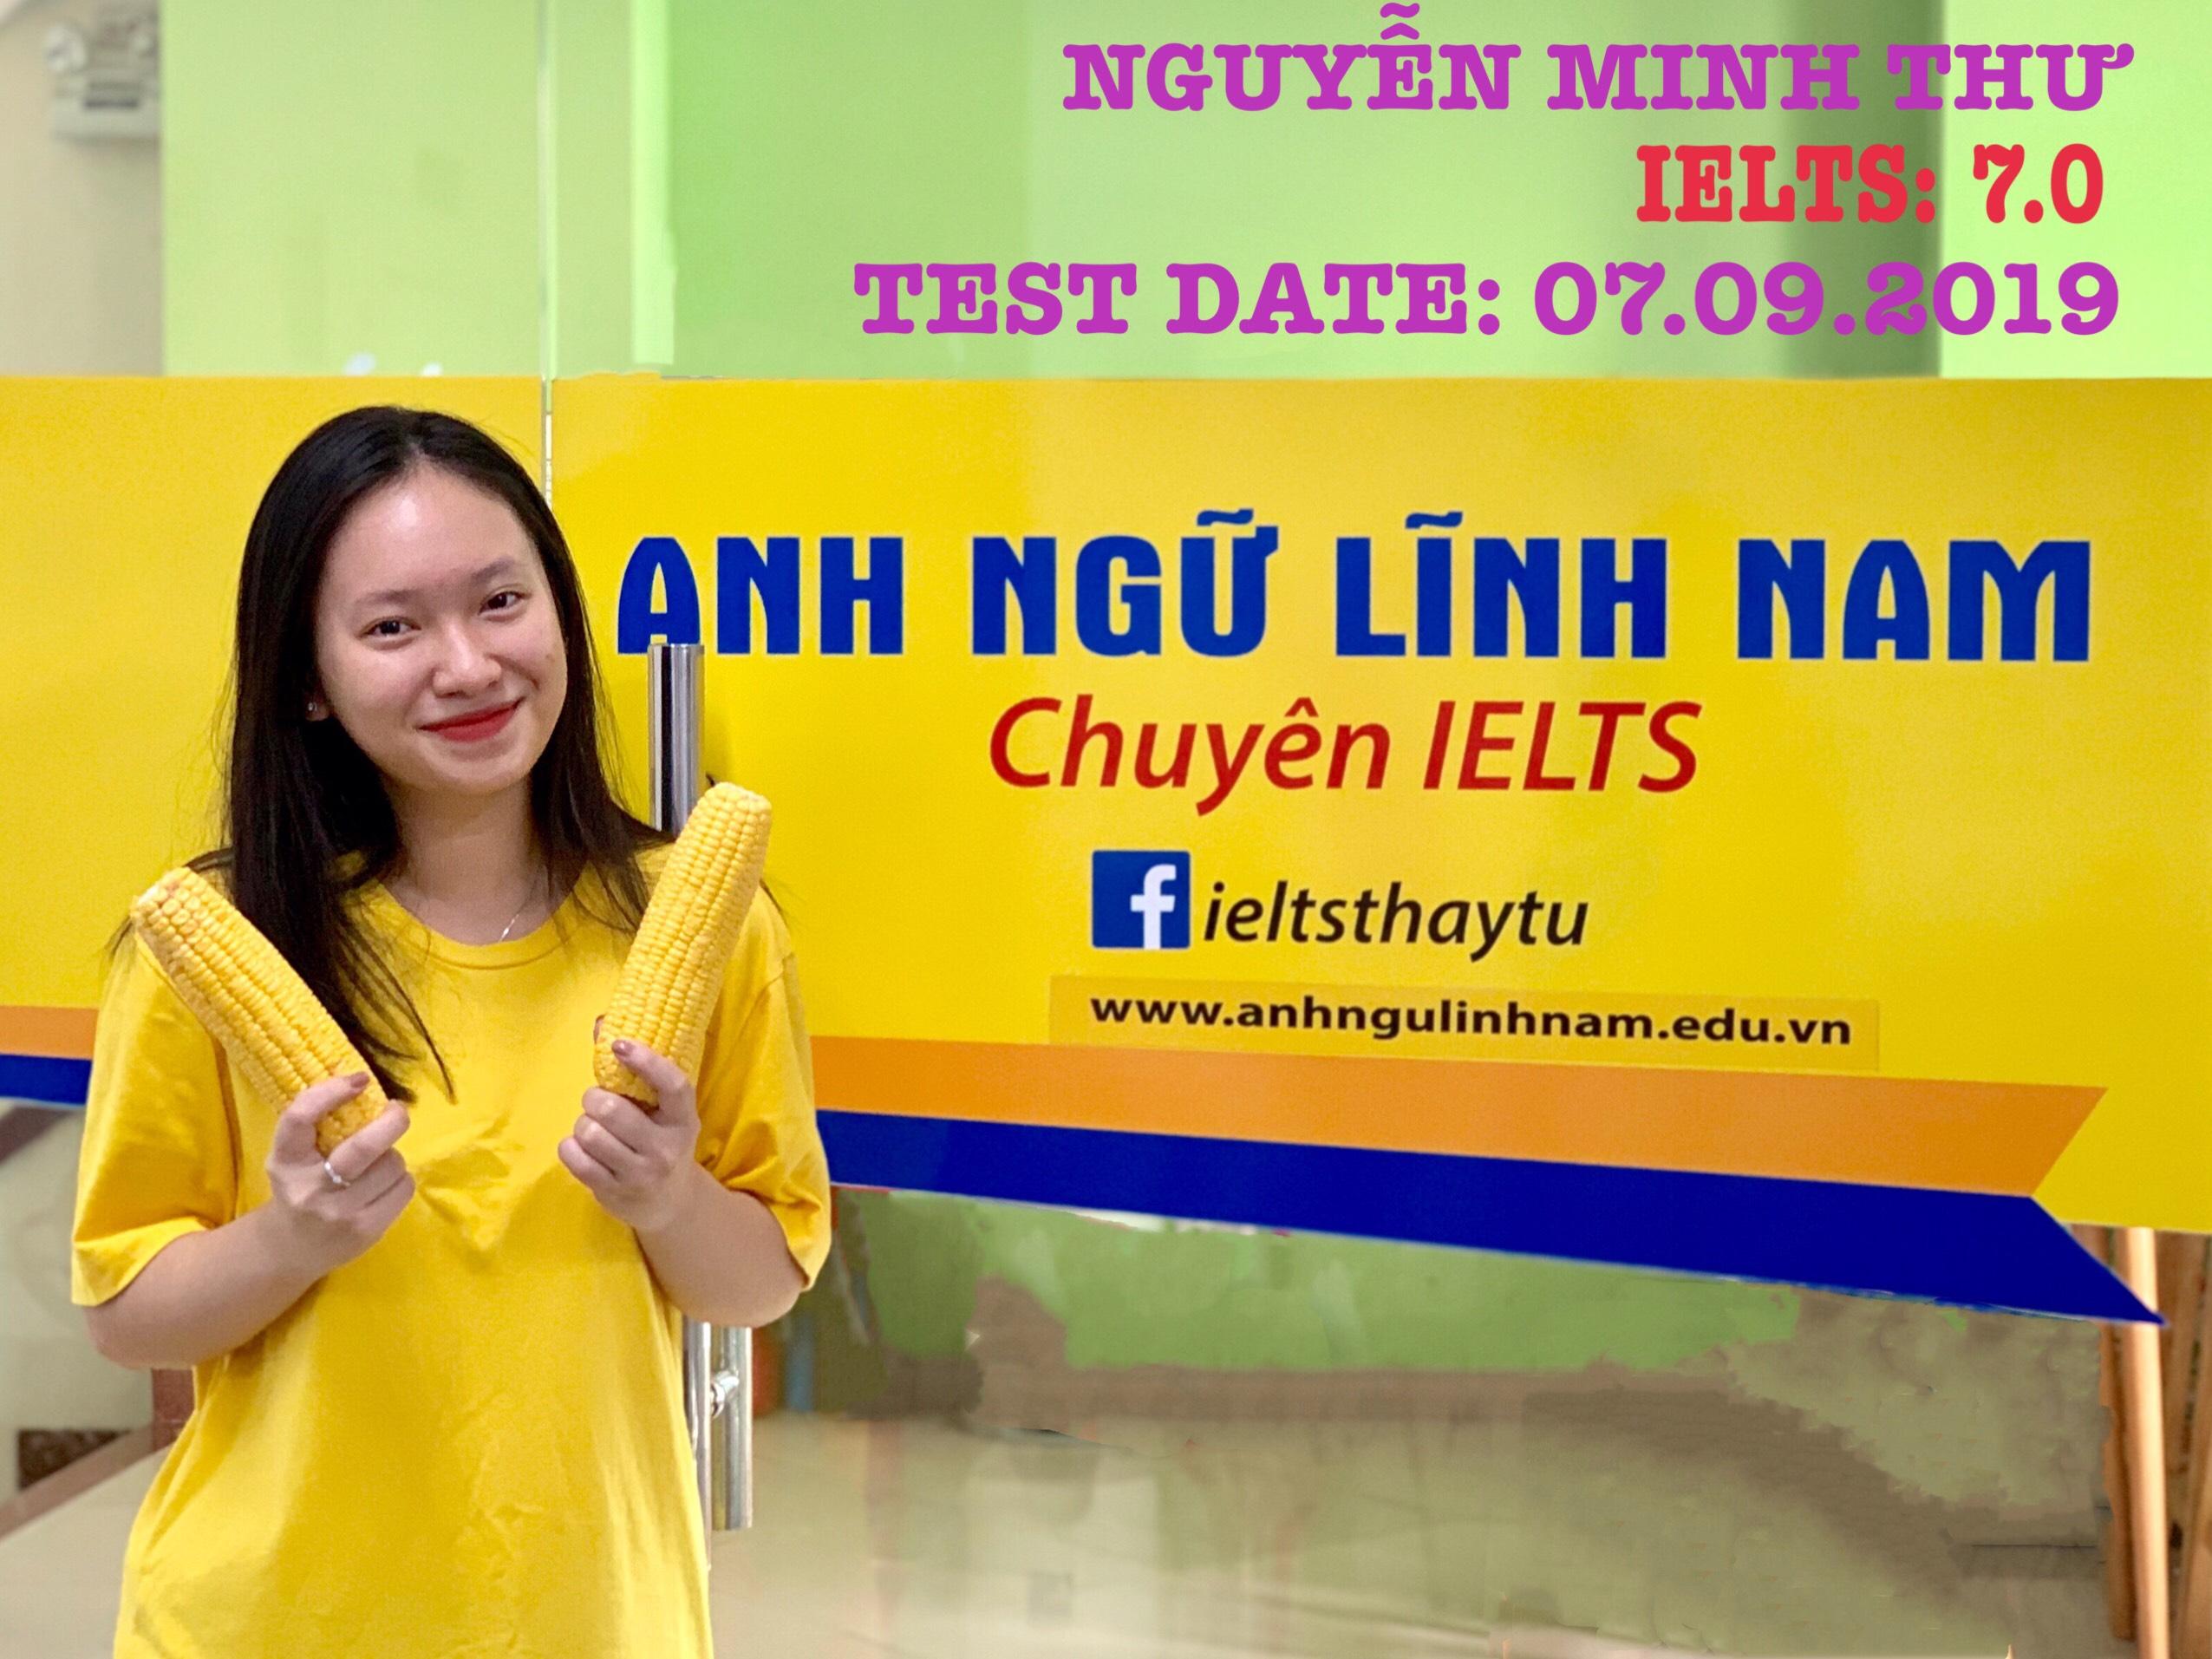 MINH THƯ-7.0-07.09.2019